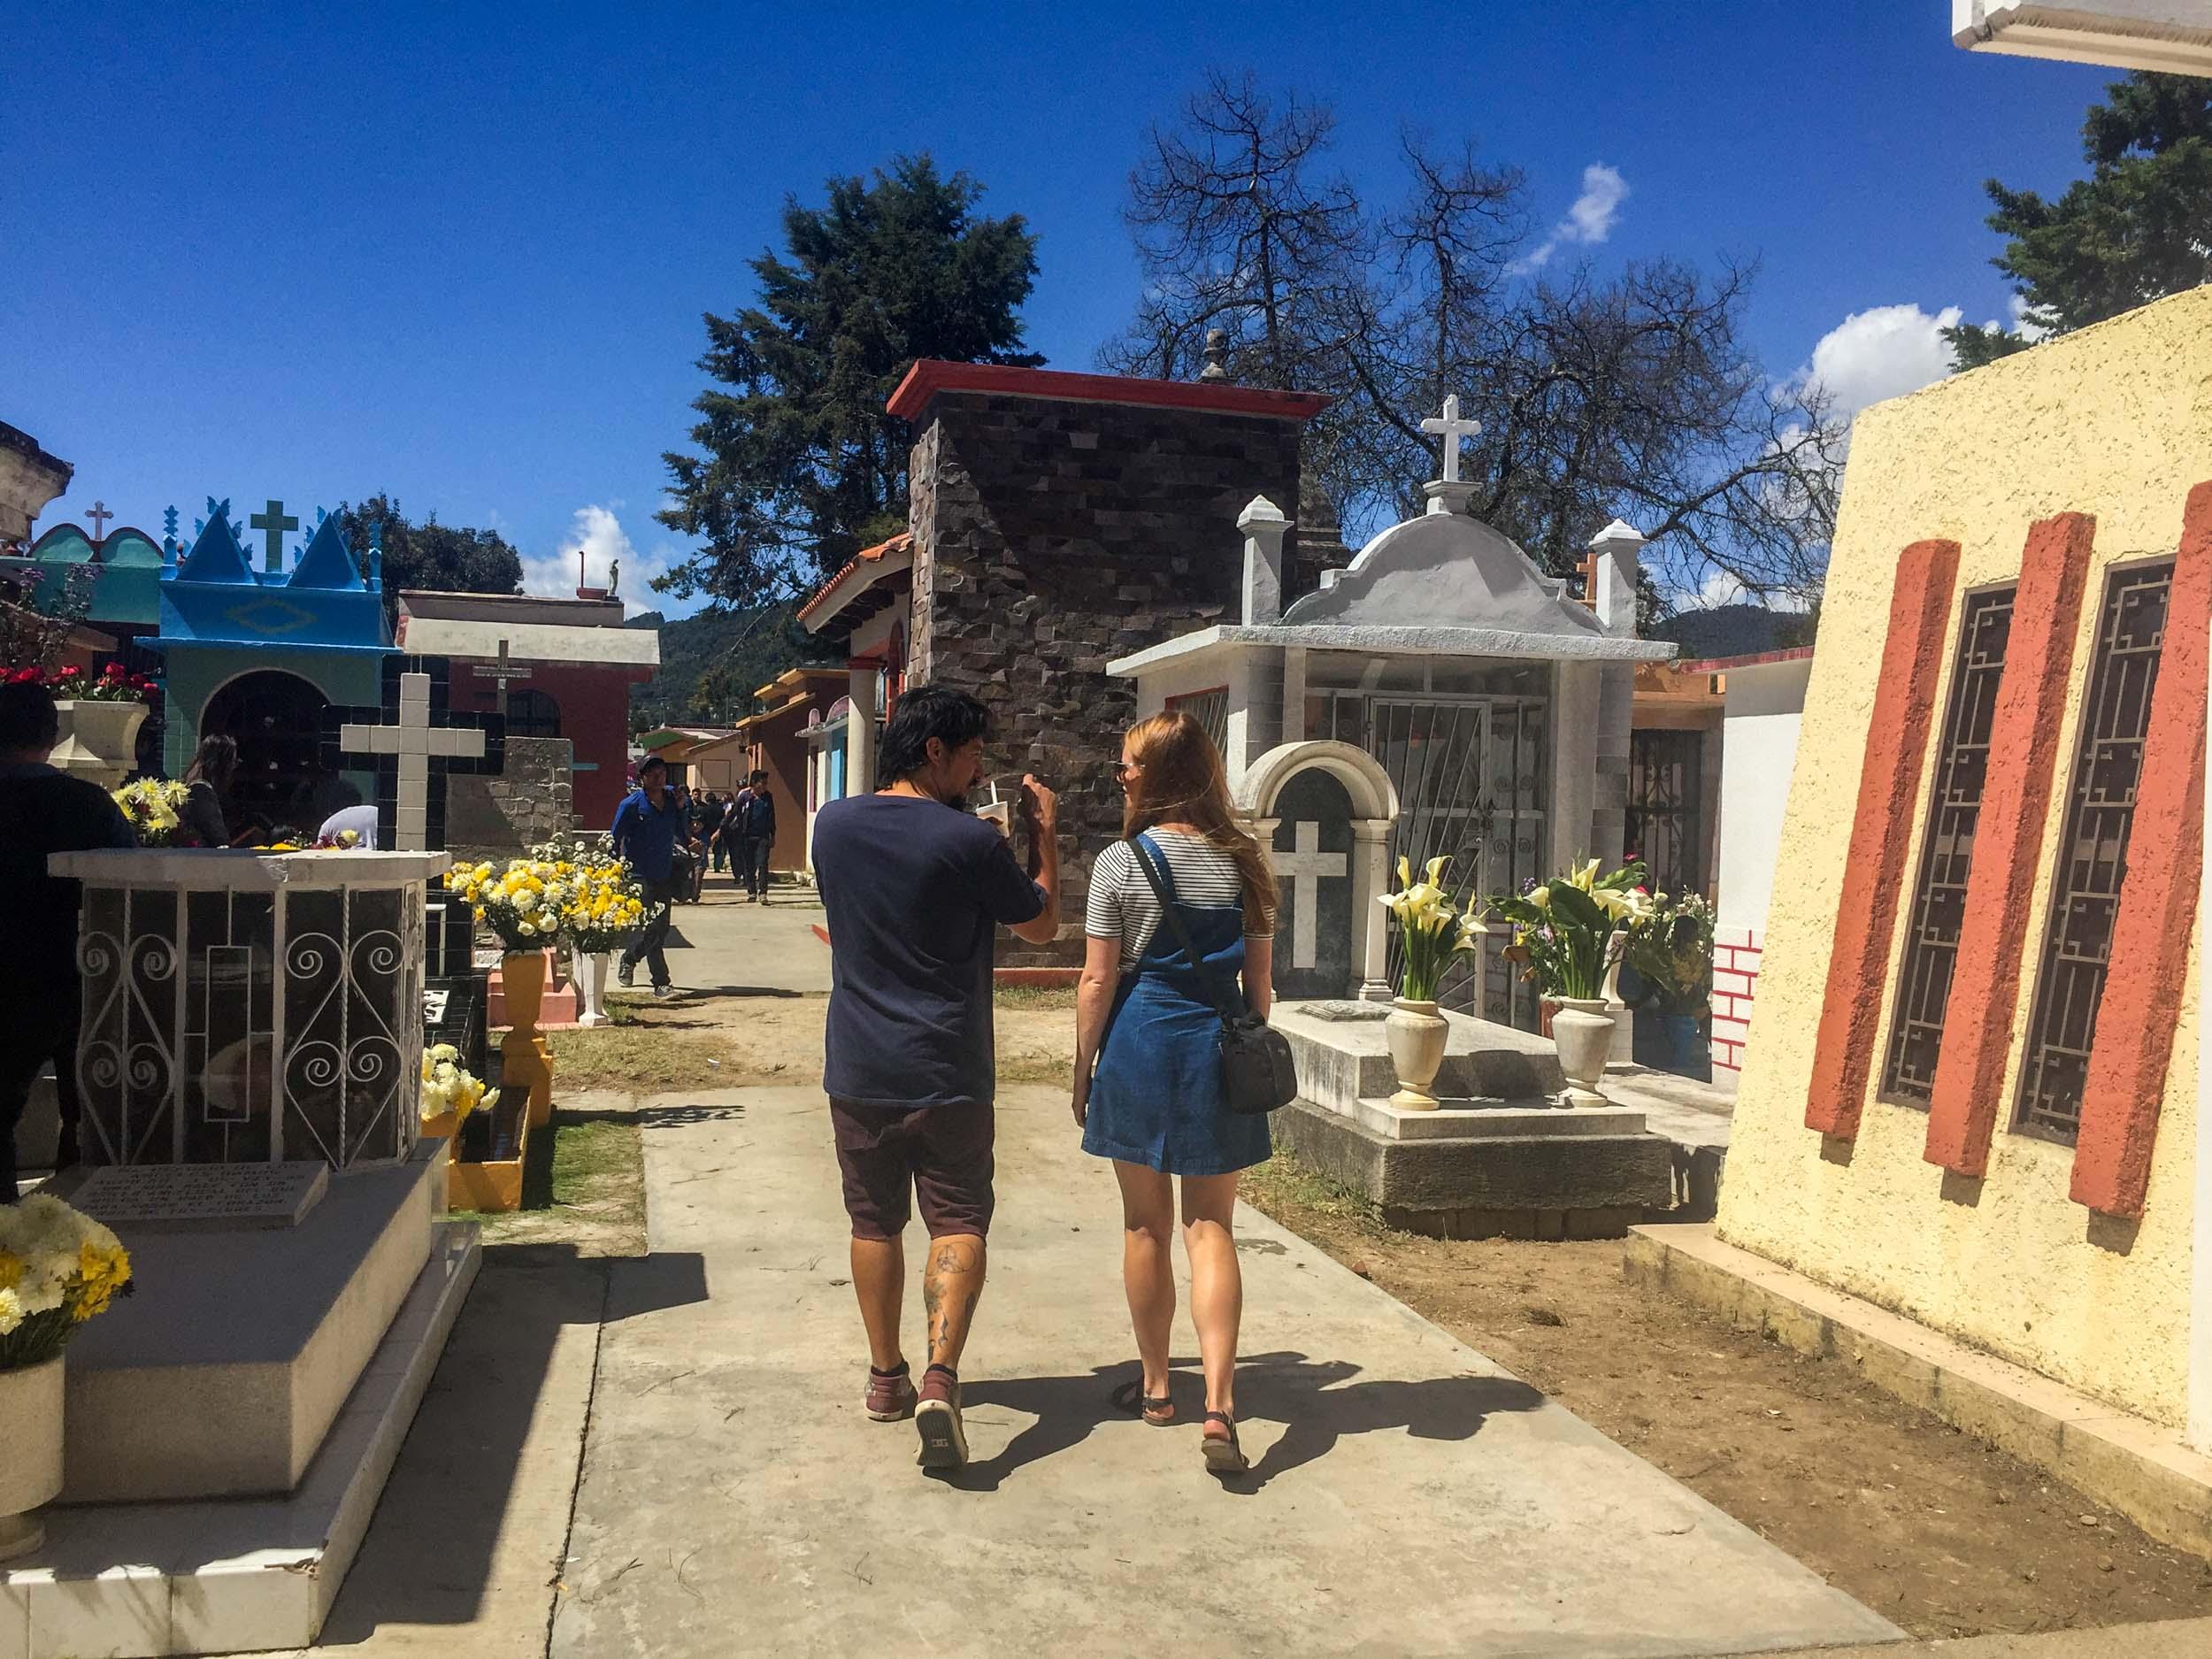 Man and woman walking and talking as they walk through cemetery in San Cristobal de las Casas, Mexico.